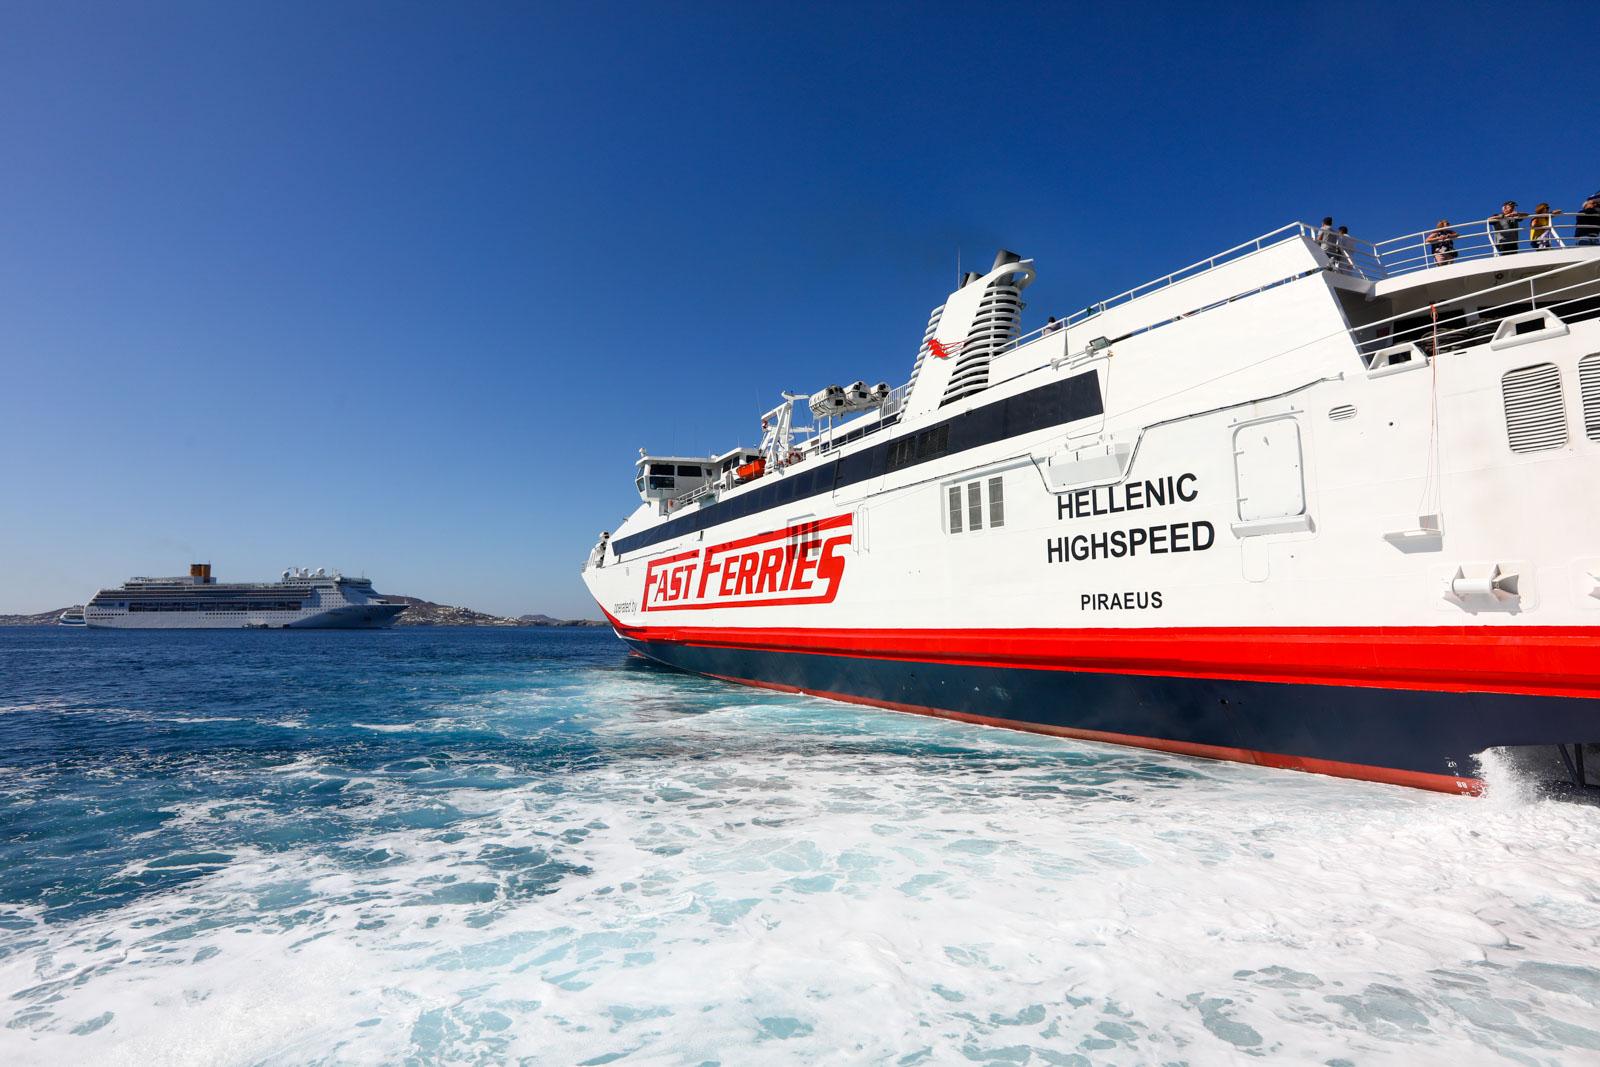 Ferry de Mykonos para Santorini